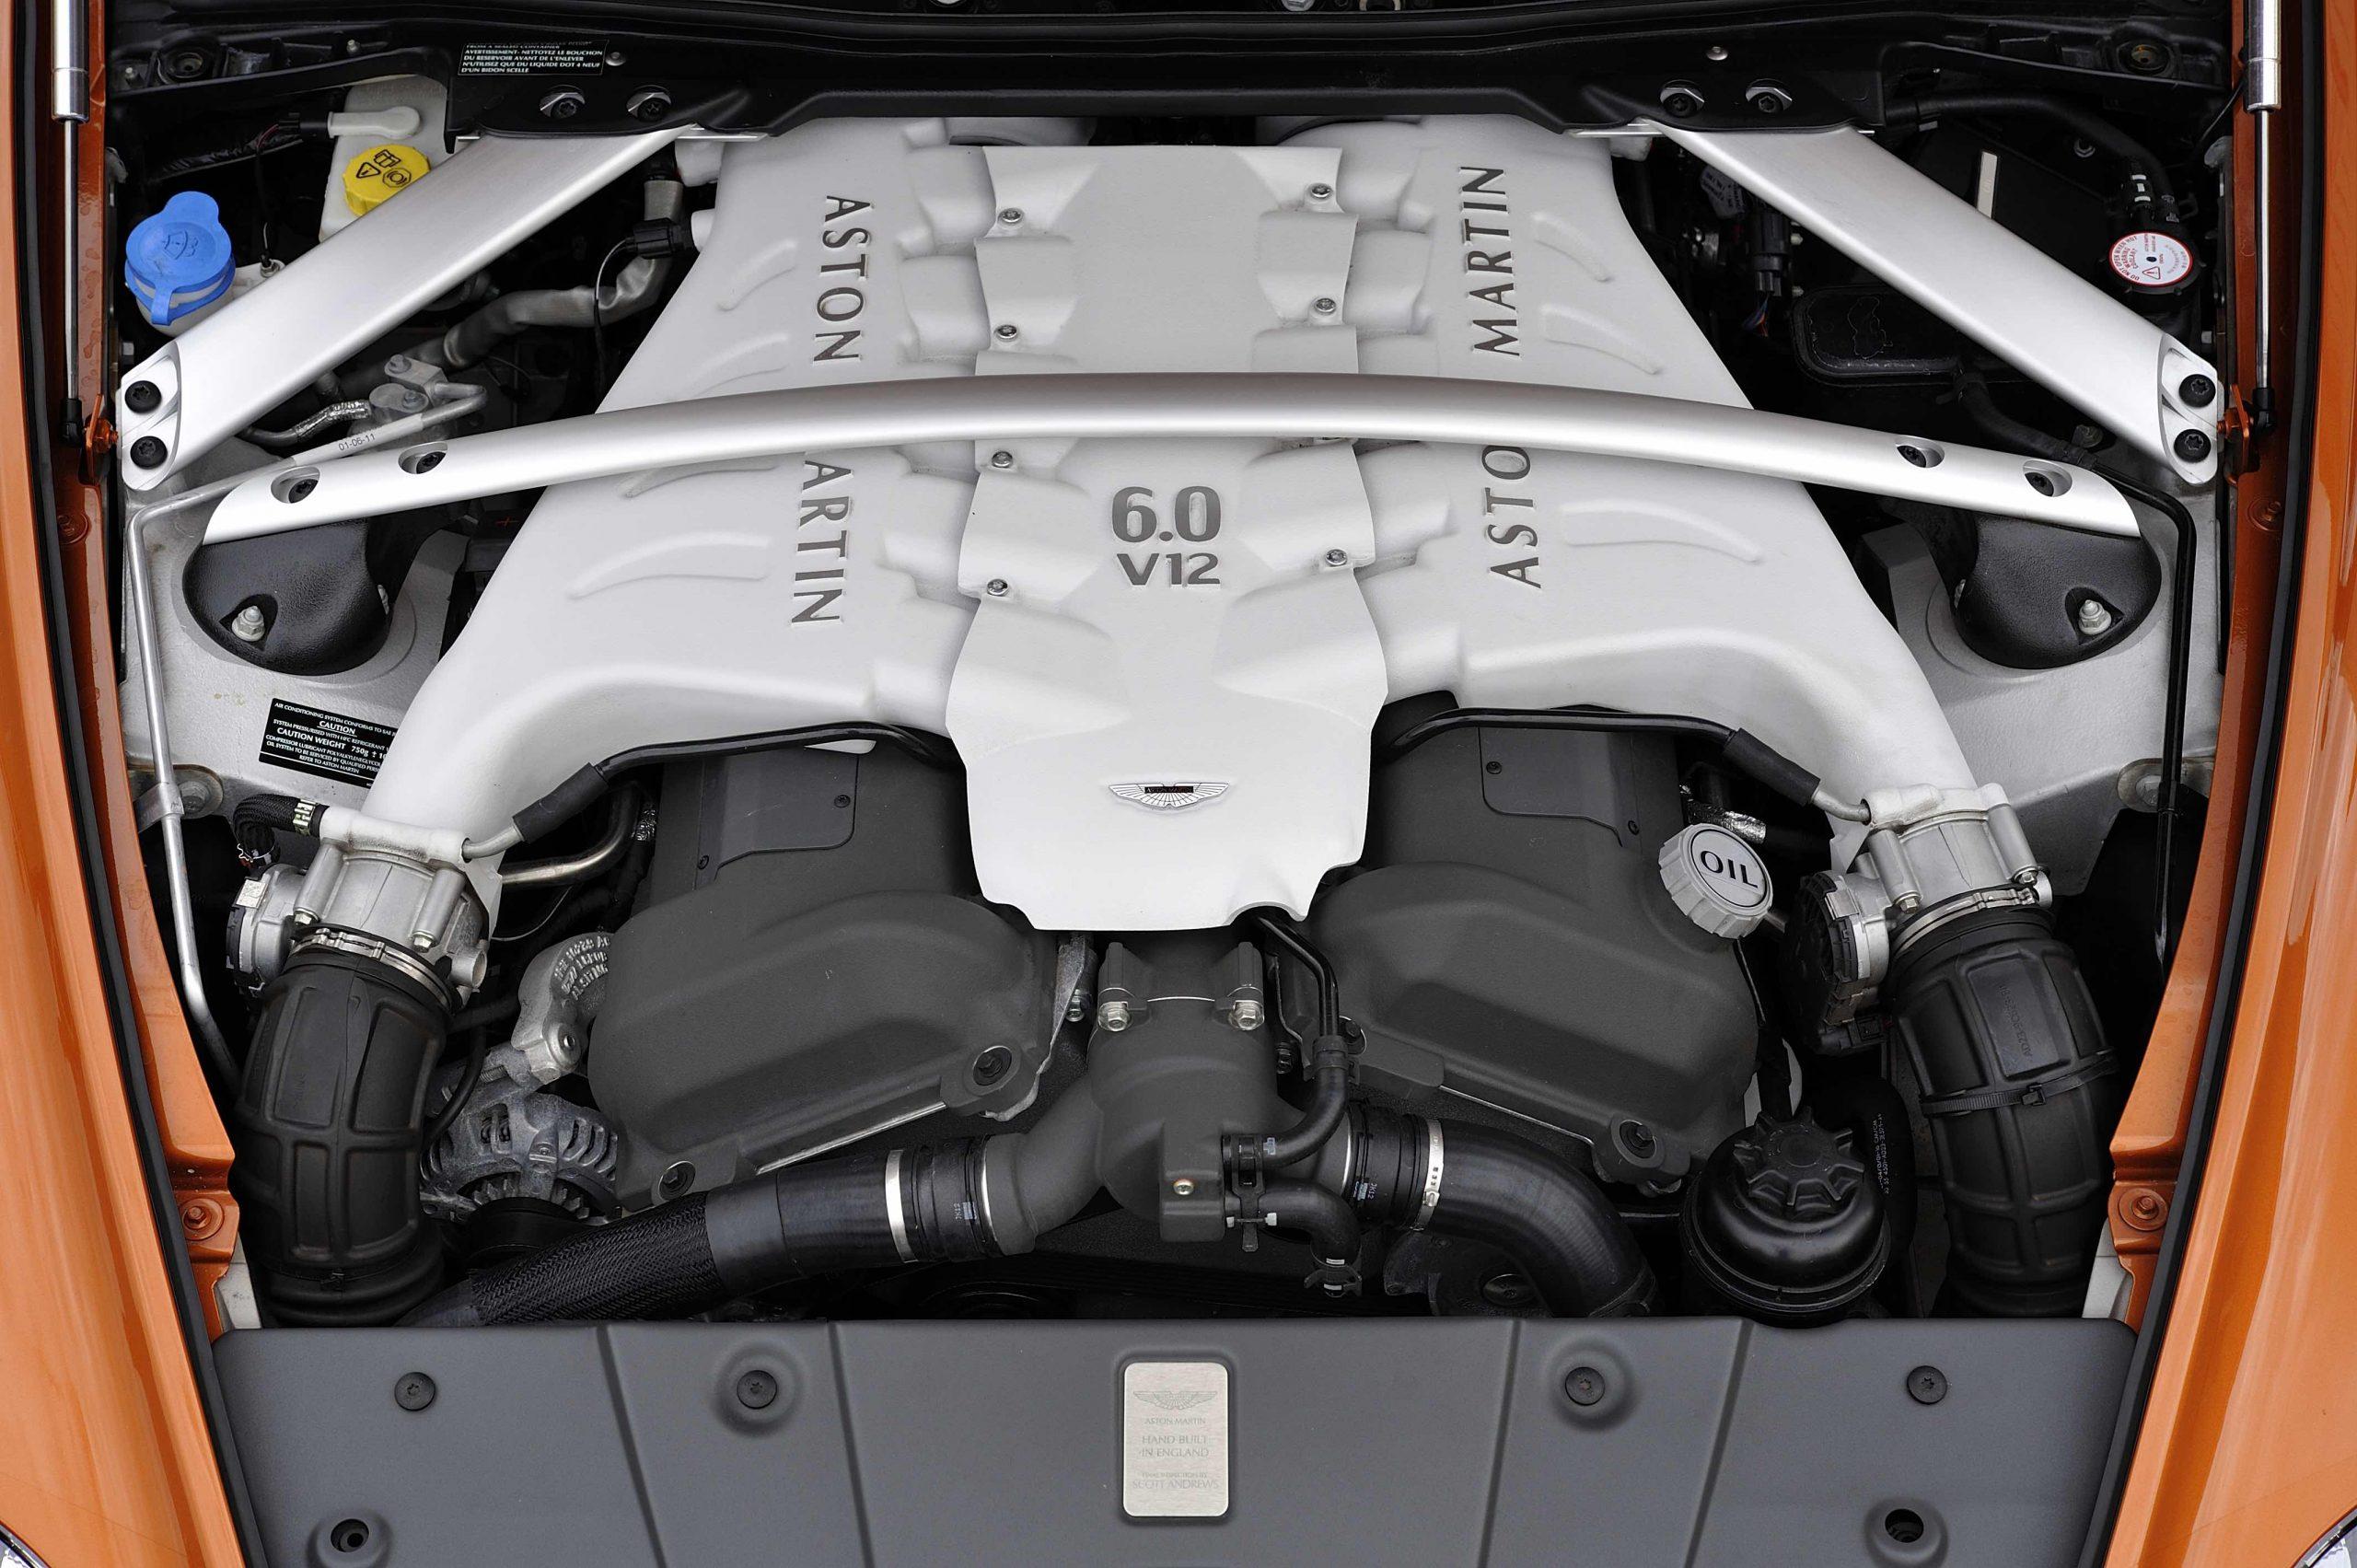 Aston Martin 6.0 V12